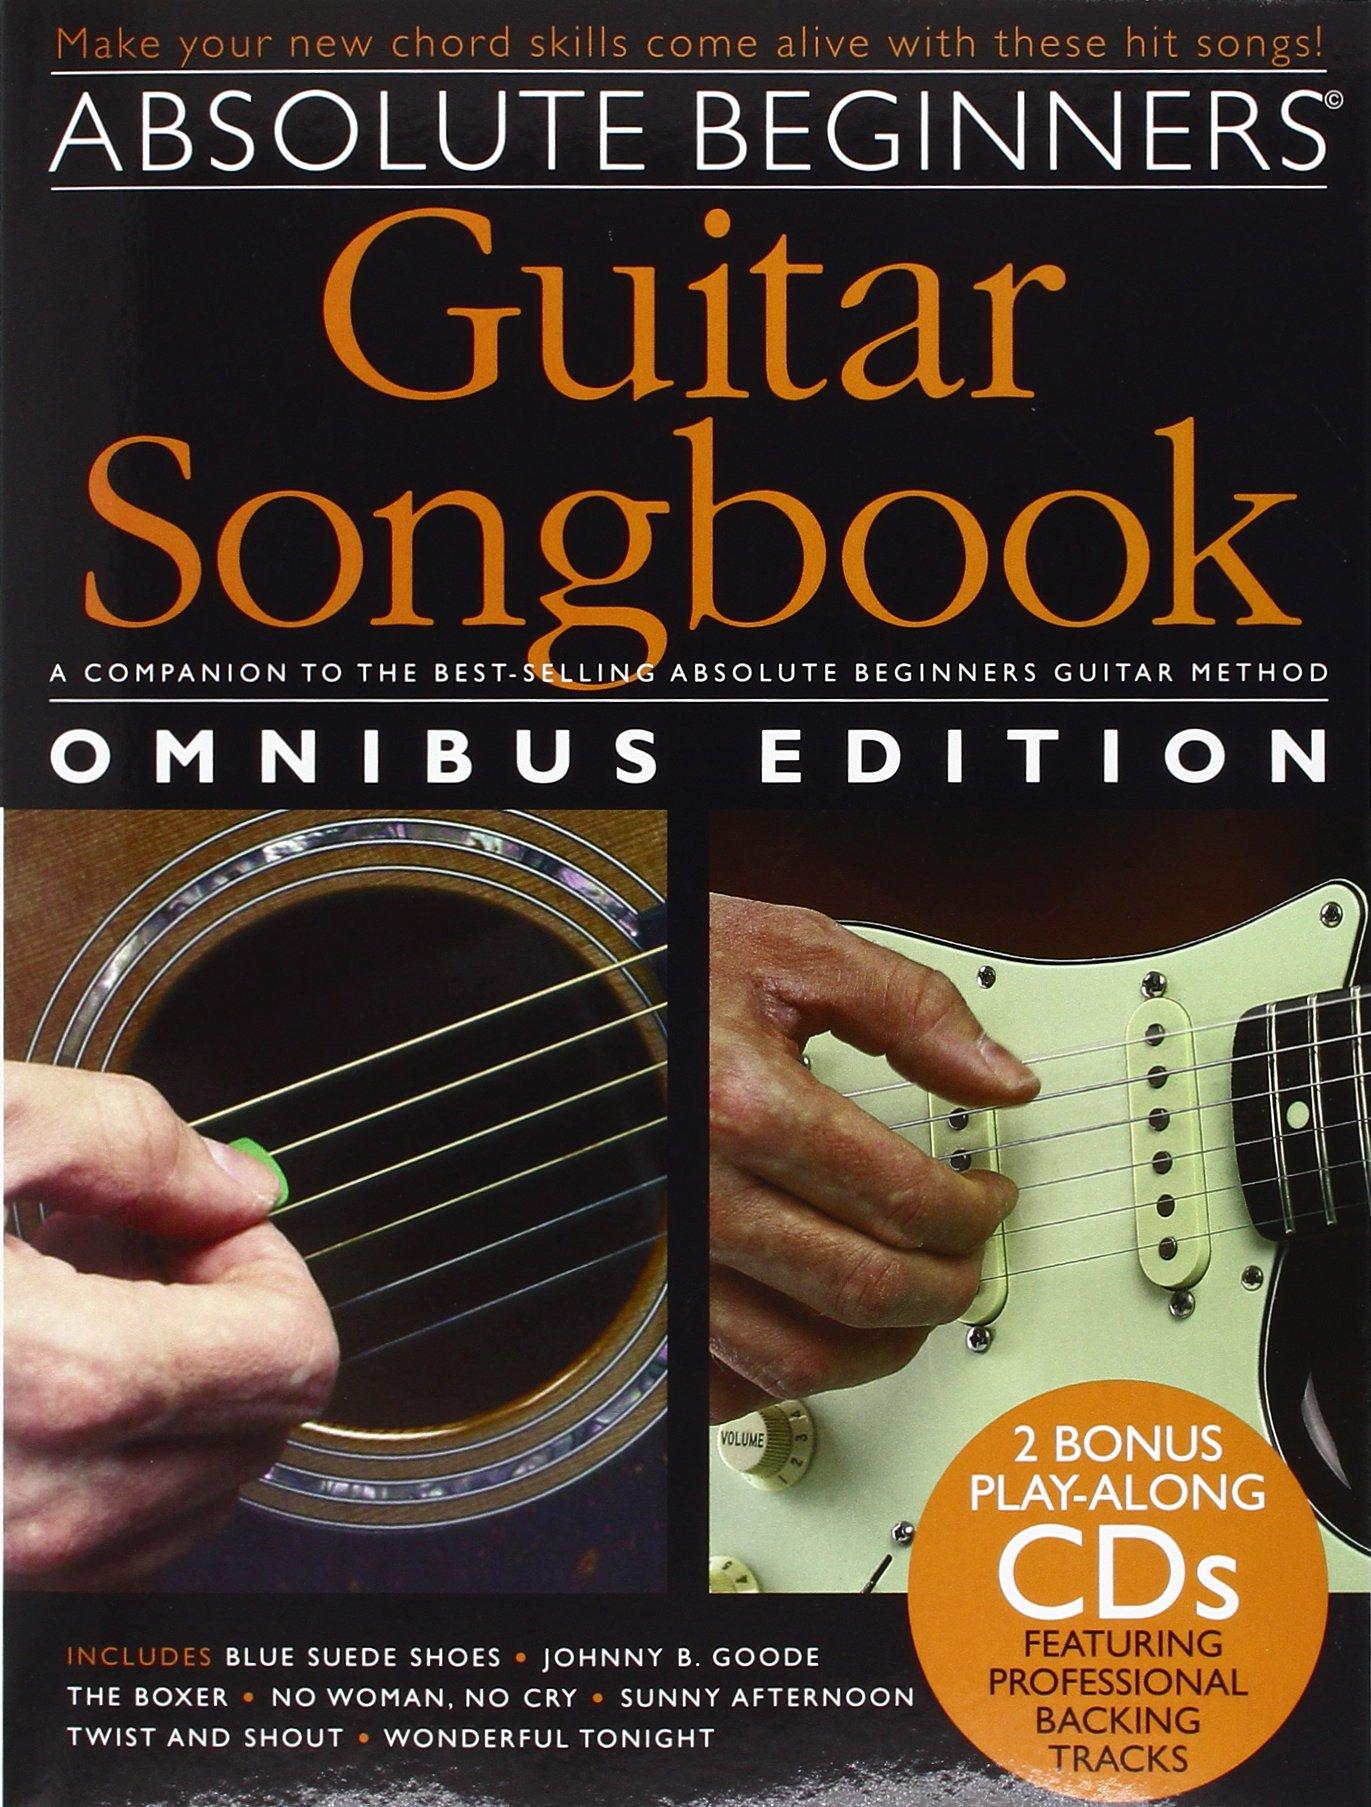 Absolute Beginners Guitar Songbook Omnibus Edition 9781849386821